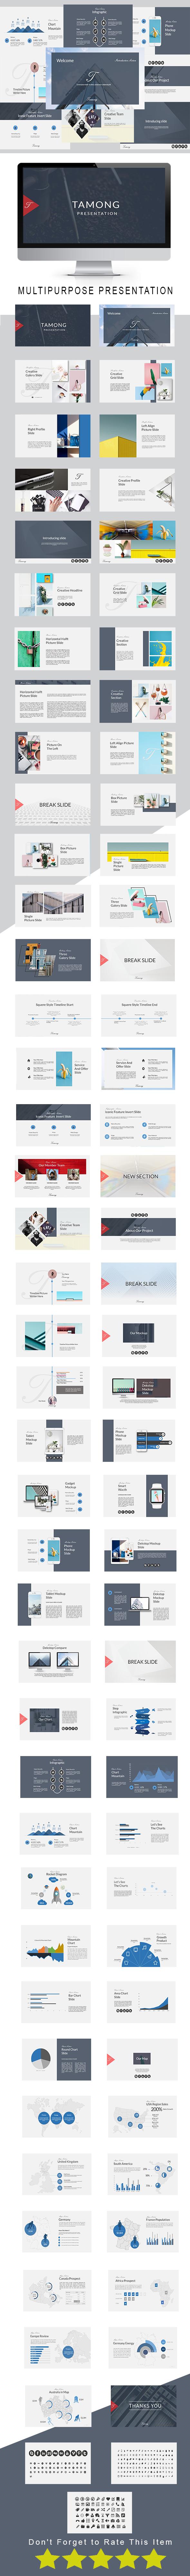 Tamong Multipurpose Keynote Template - Keynote Templates Presentation Templates